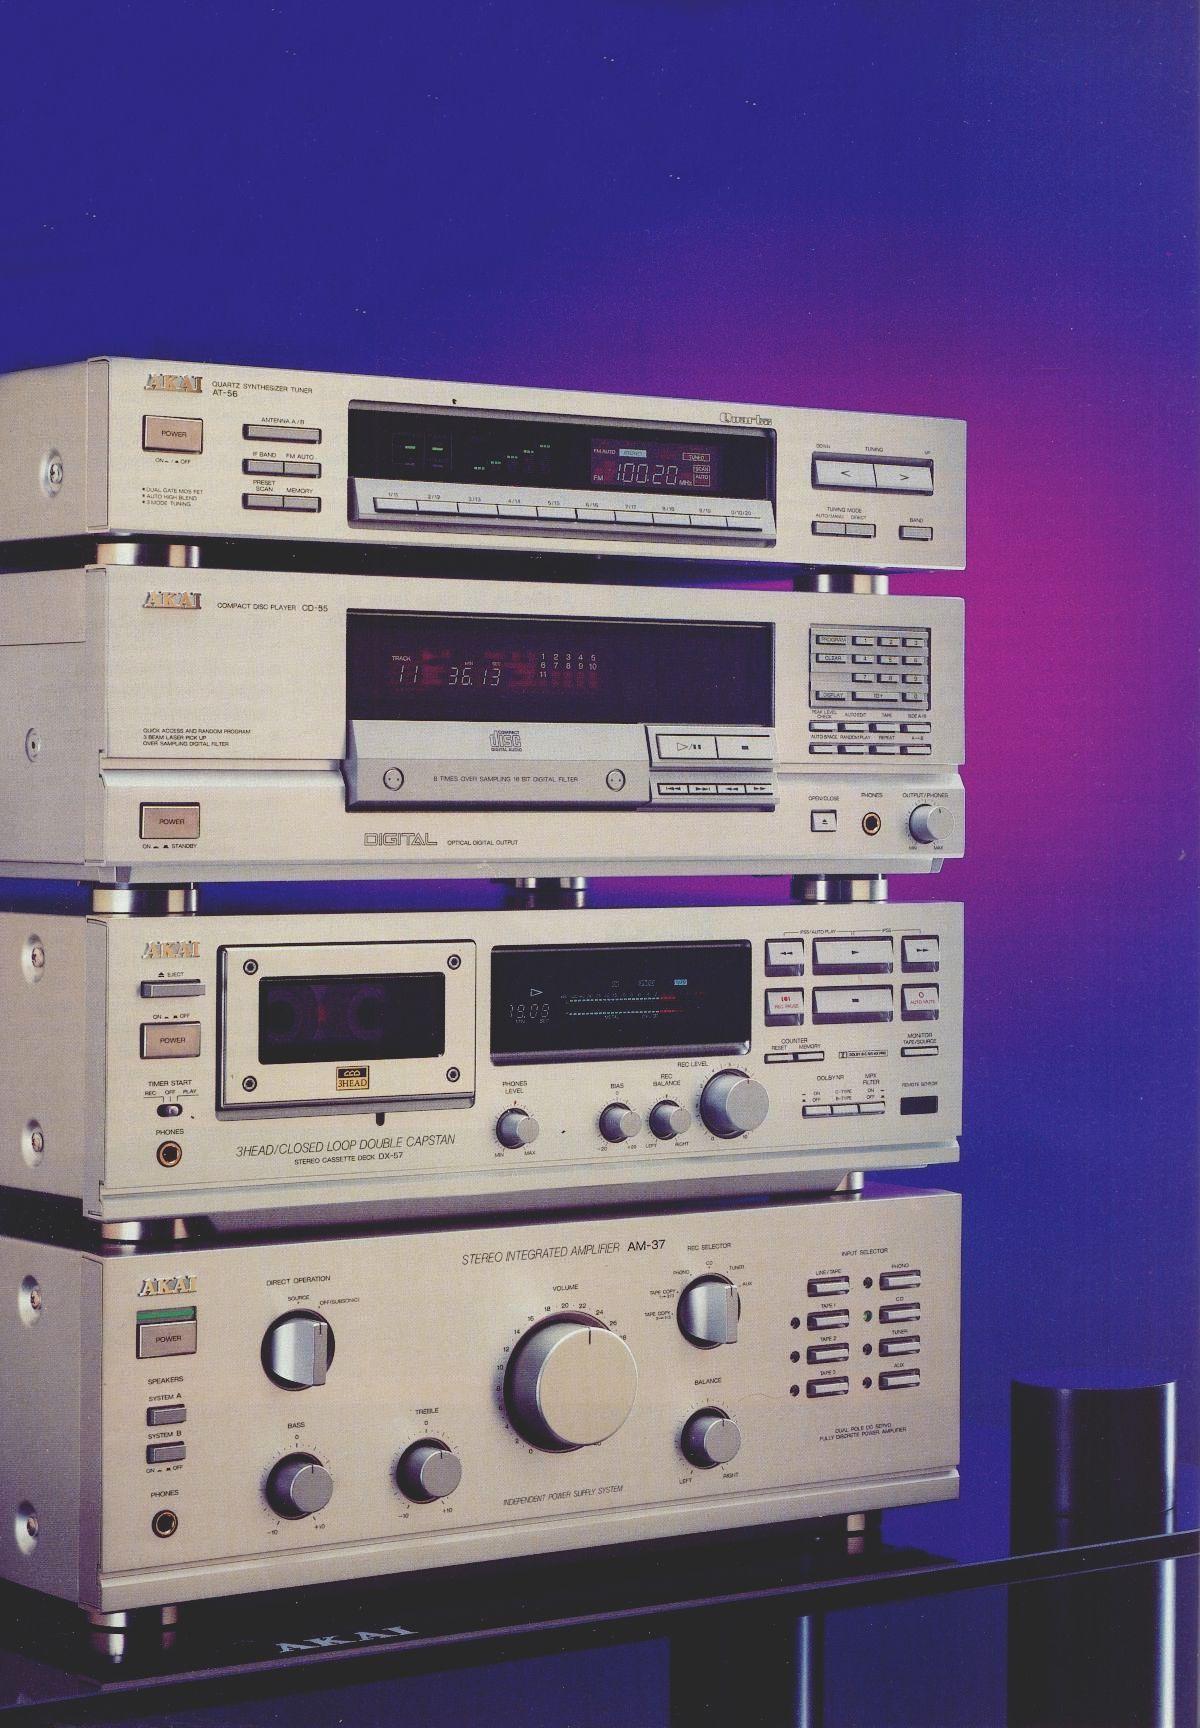 Speaker Cooler On Pinterest Decimal Electronics And Speakers